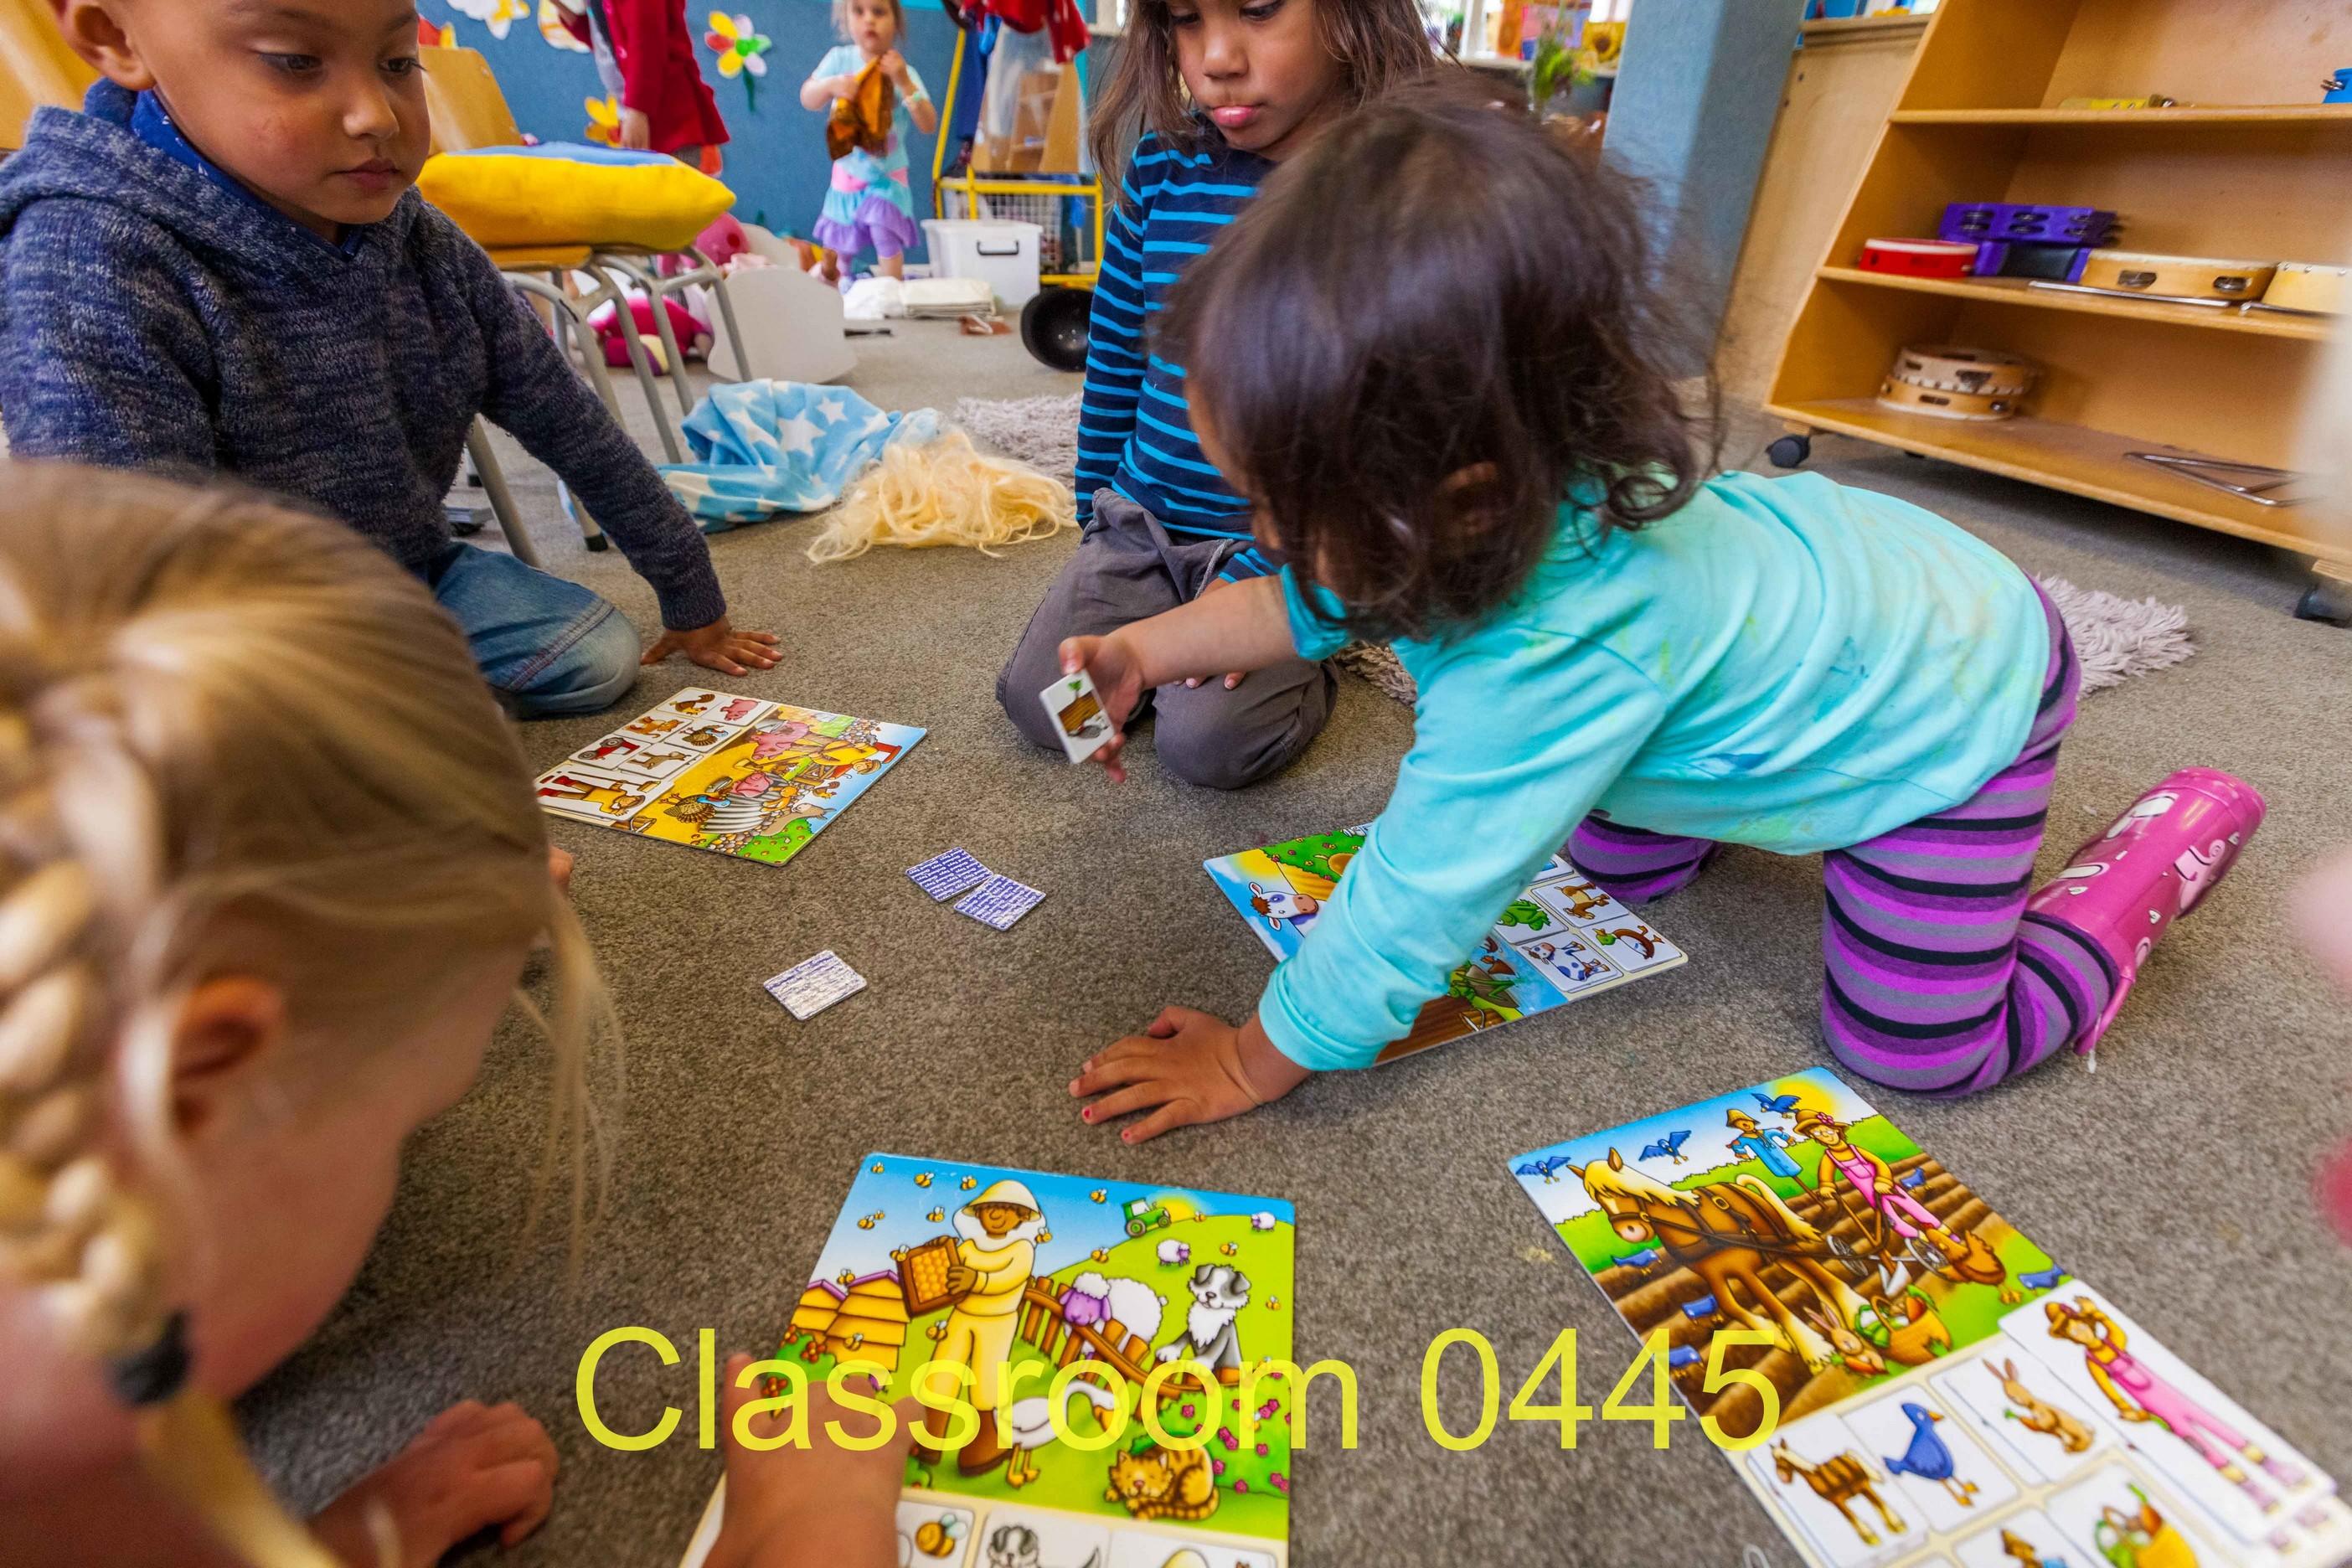 Classroom 0445